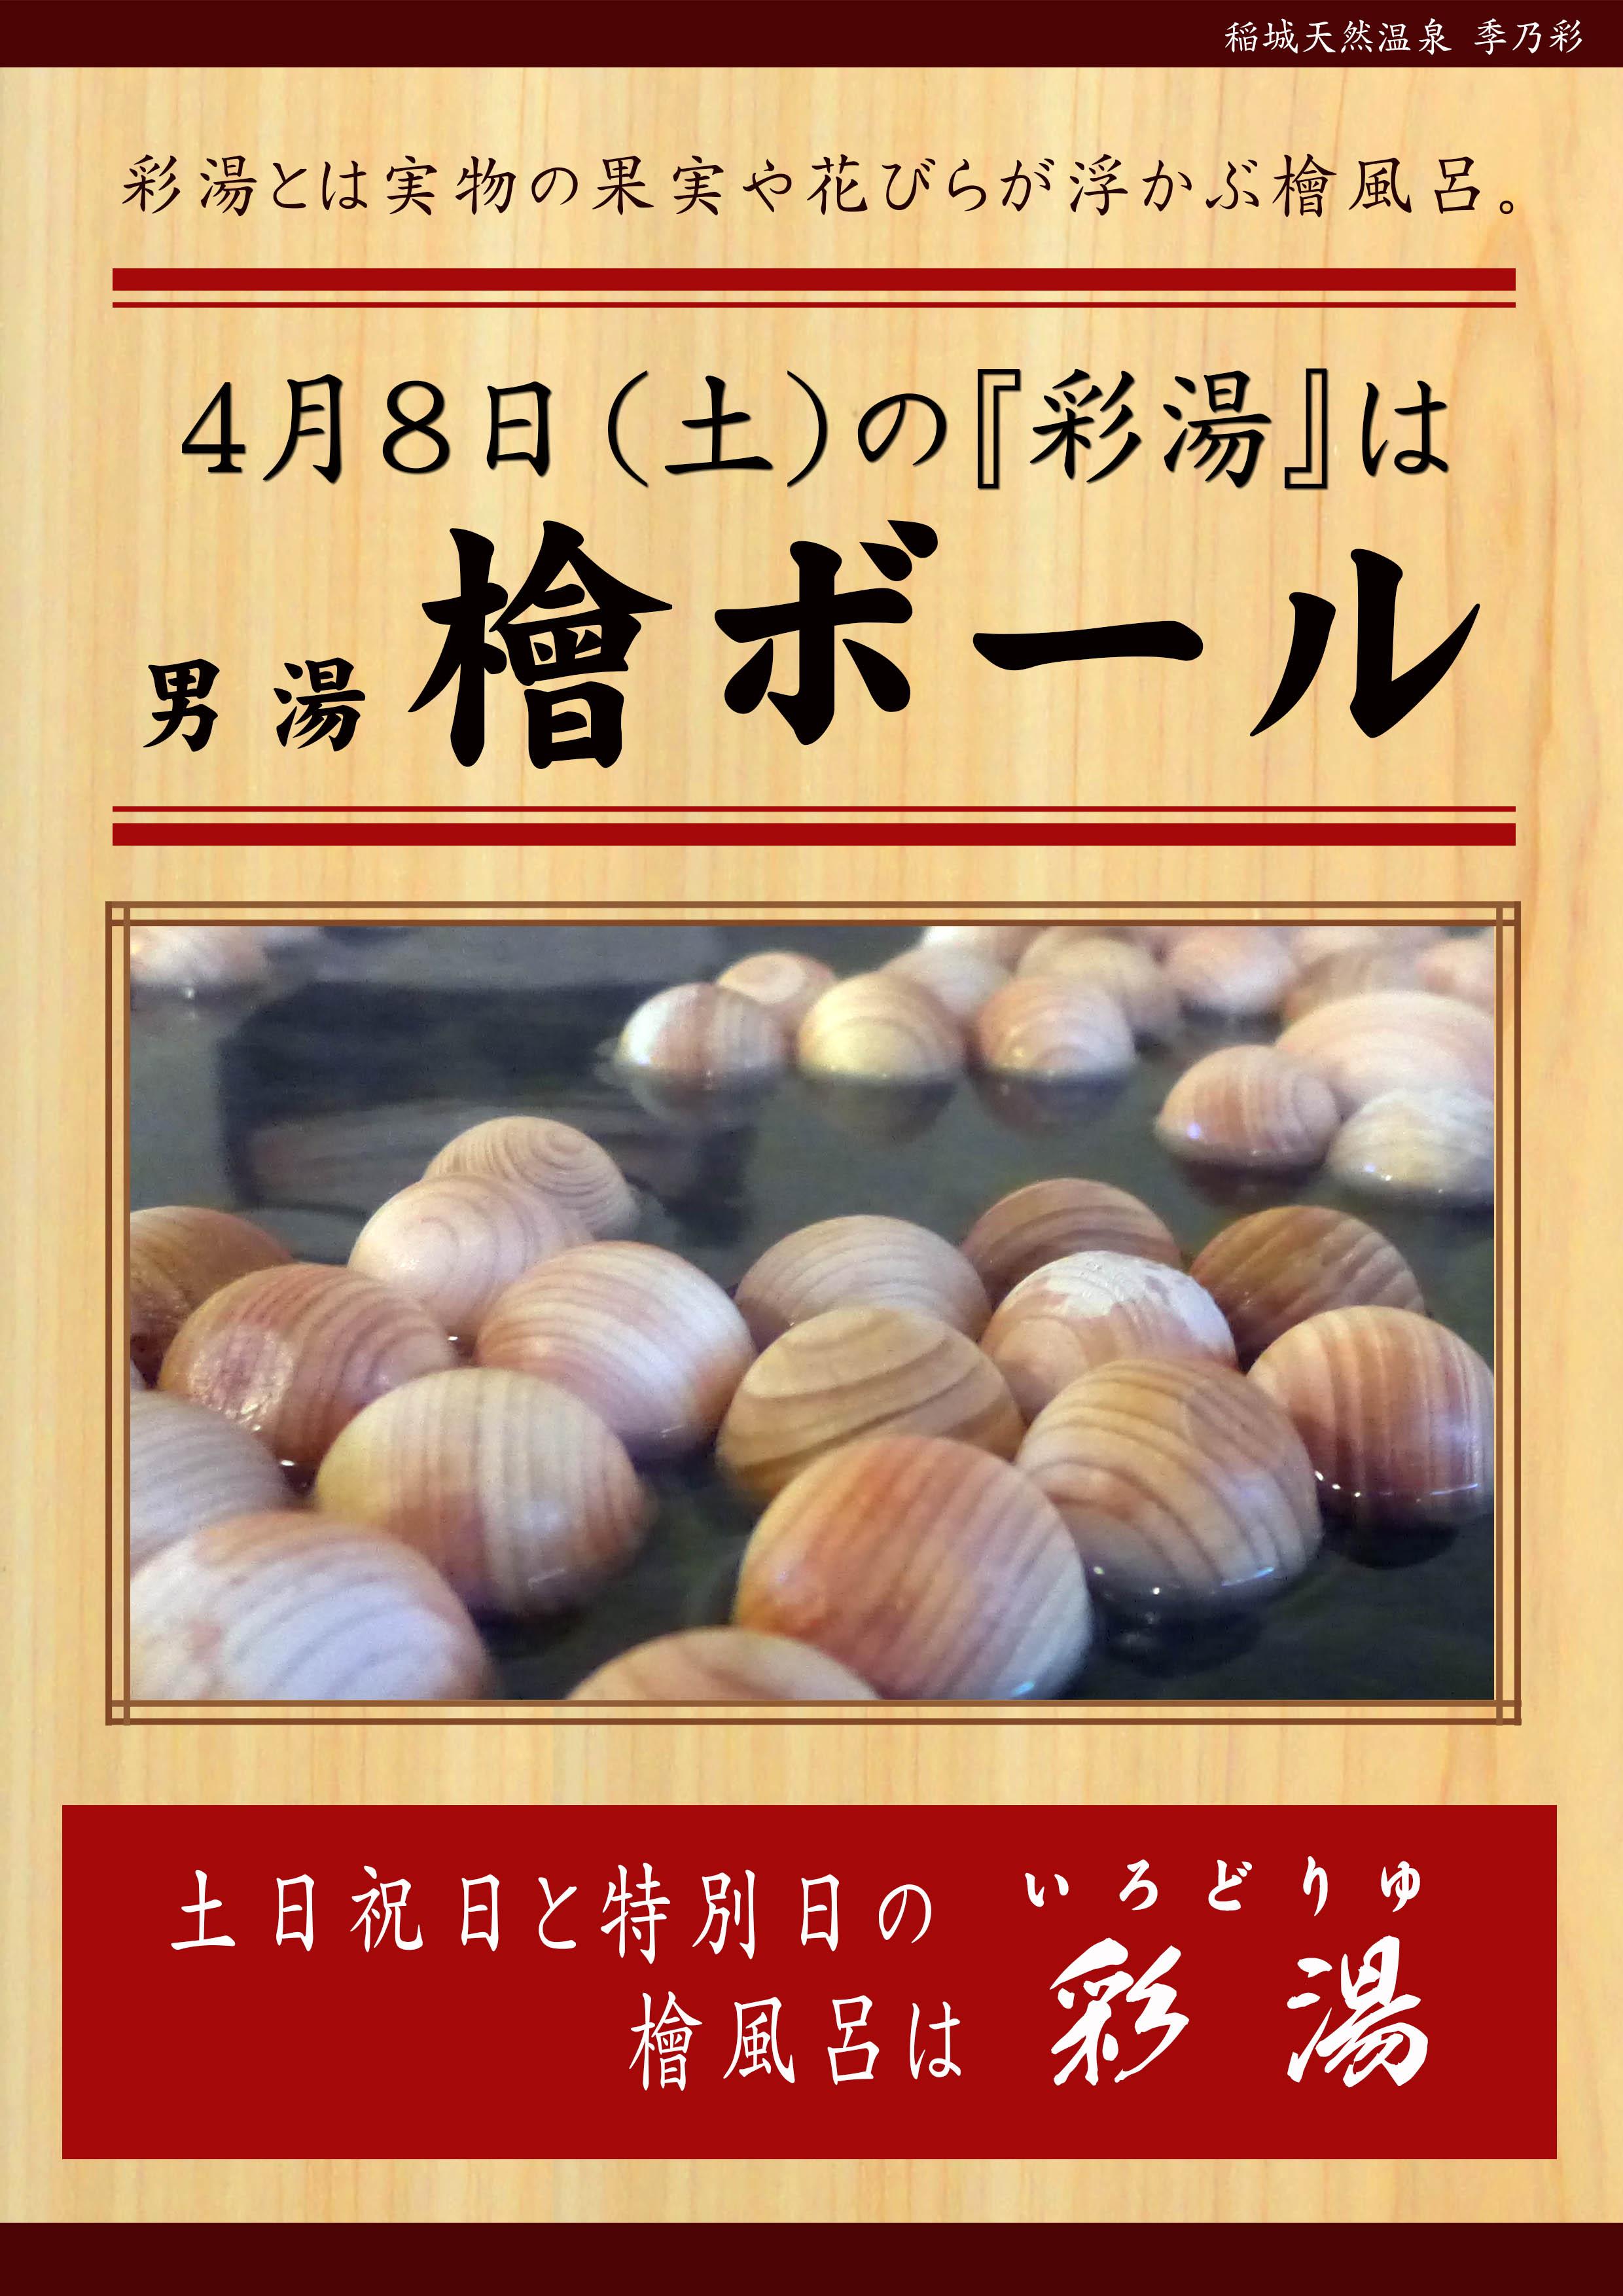 20170408POP イベント 彩湯 男湯 檜ボール